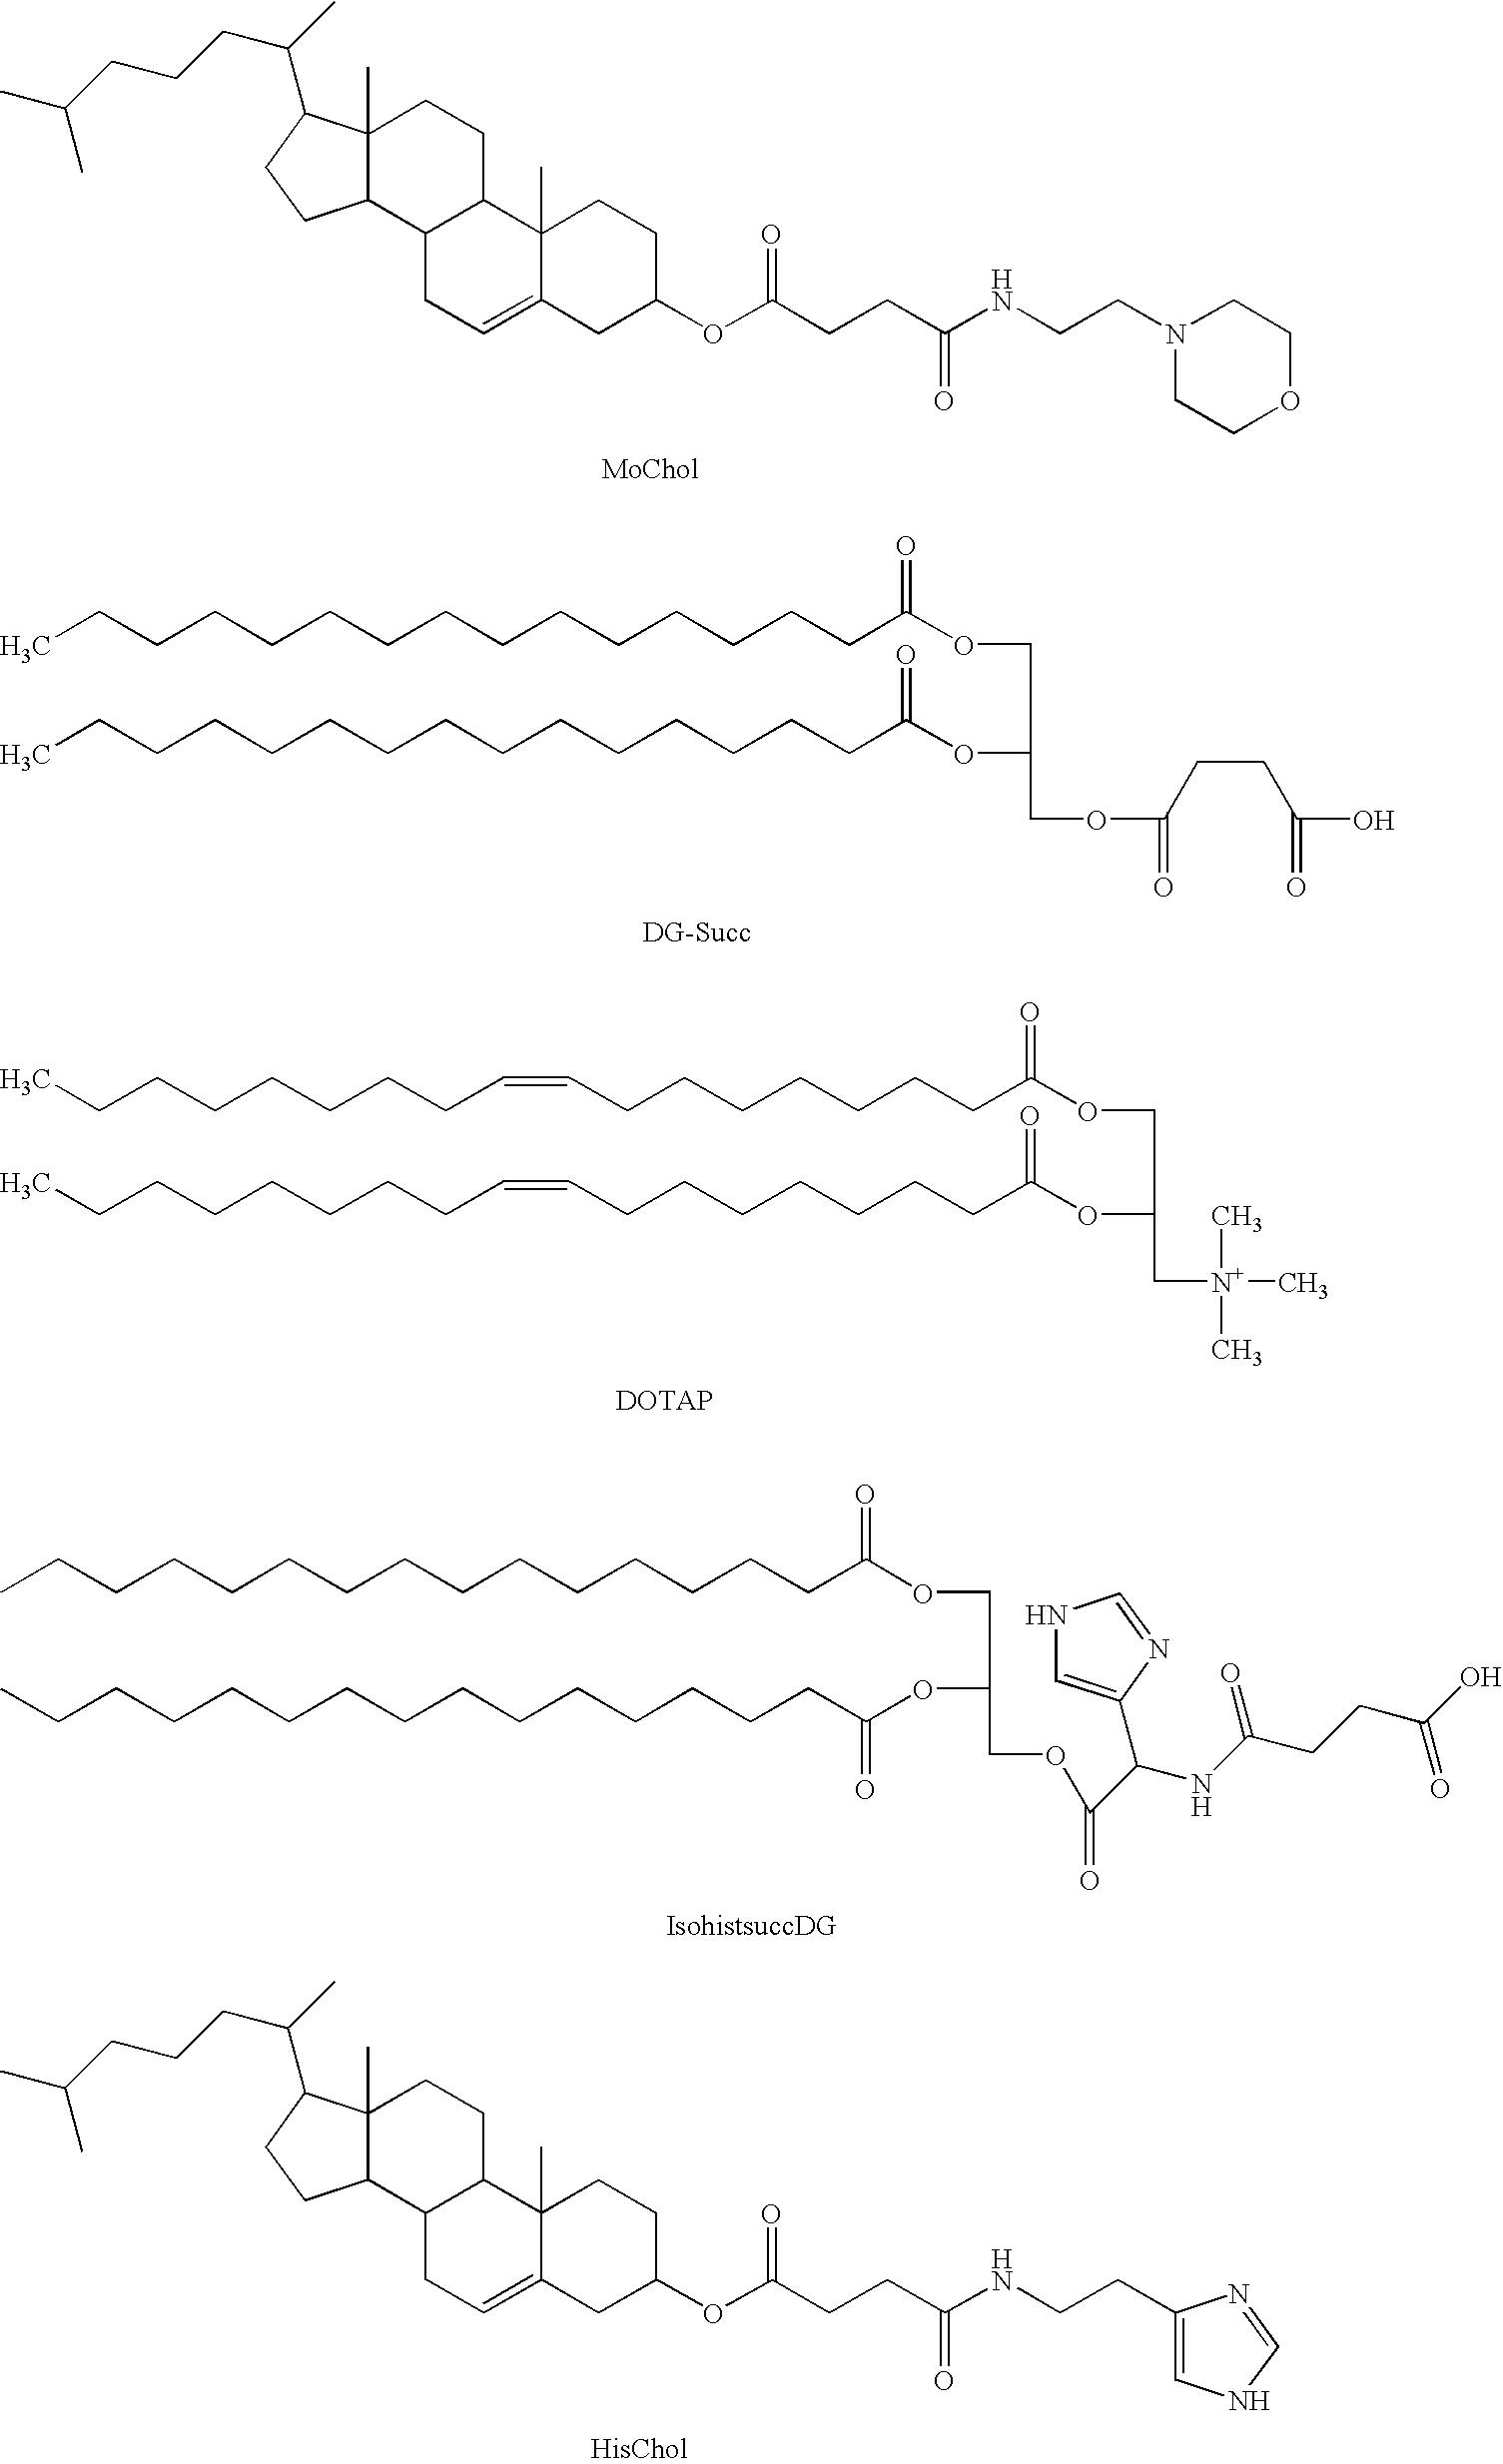 US8367628B2 - Amphoteric liposome formulation - Google Patents